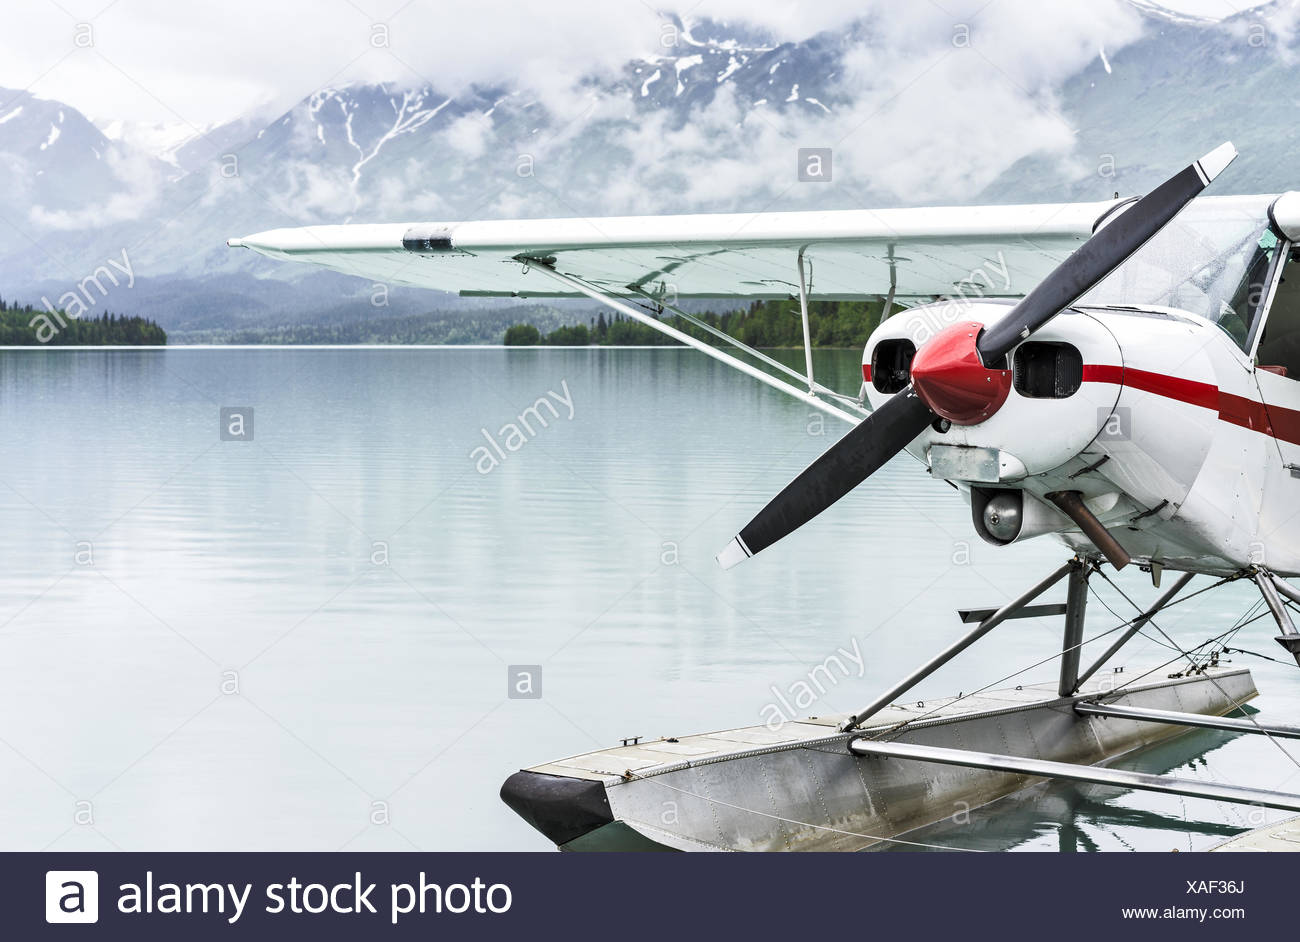 USA, Alaska, Kenai, Moose Pass, Float plane at dock on lake - Stock Image